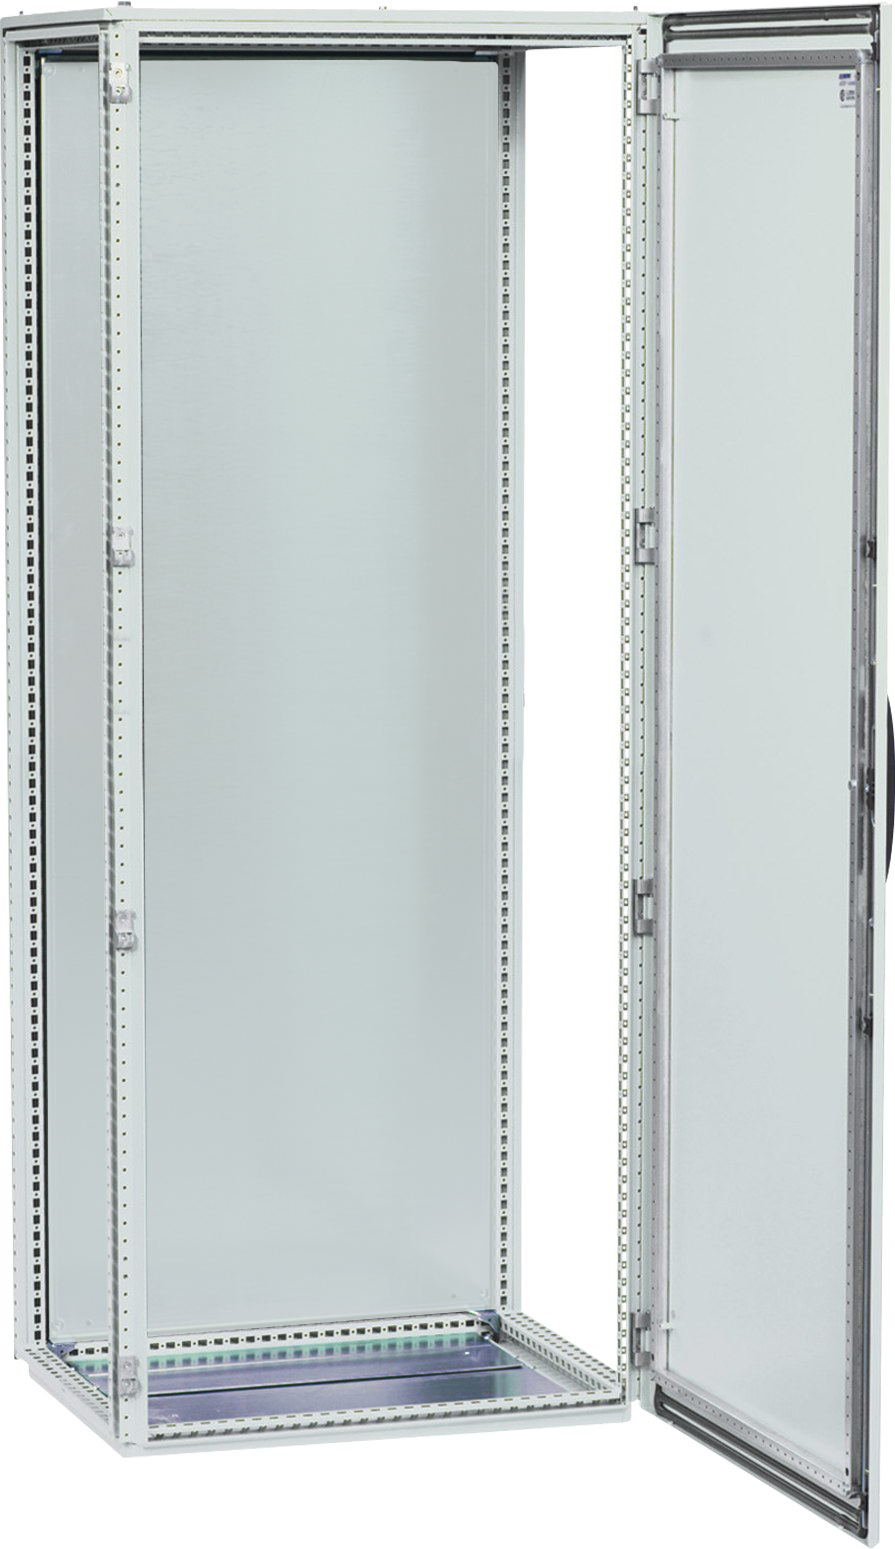 1 Stk Anreihschrank 1-türig, 2000x600x600mm, RAL 7035 AS206061-5